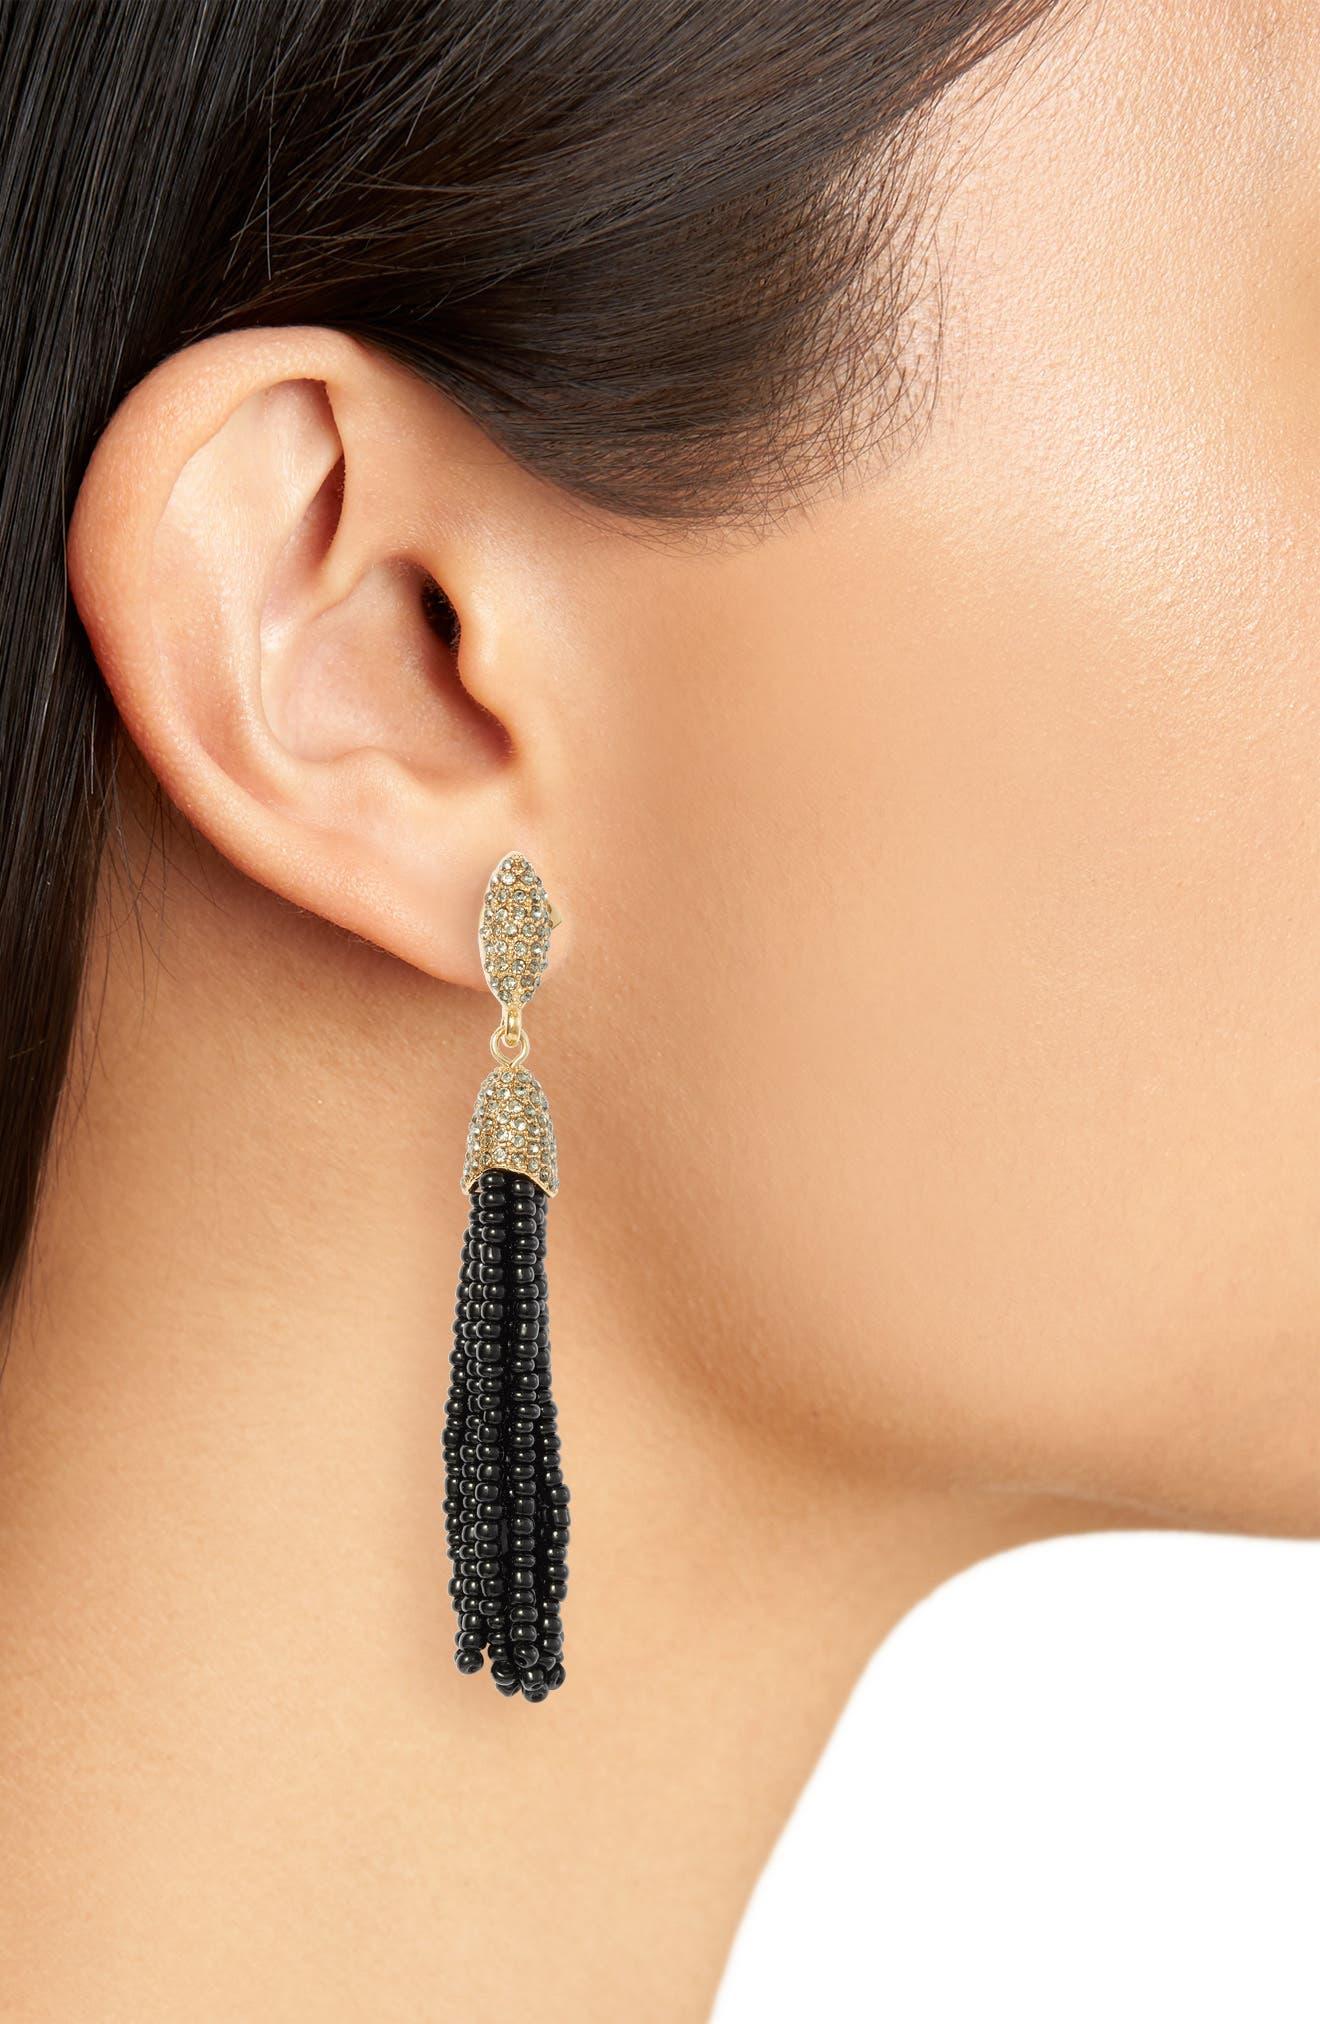 Seed Bead Tassel Earrings,                             Alternate thumbnail 2, color,                             710